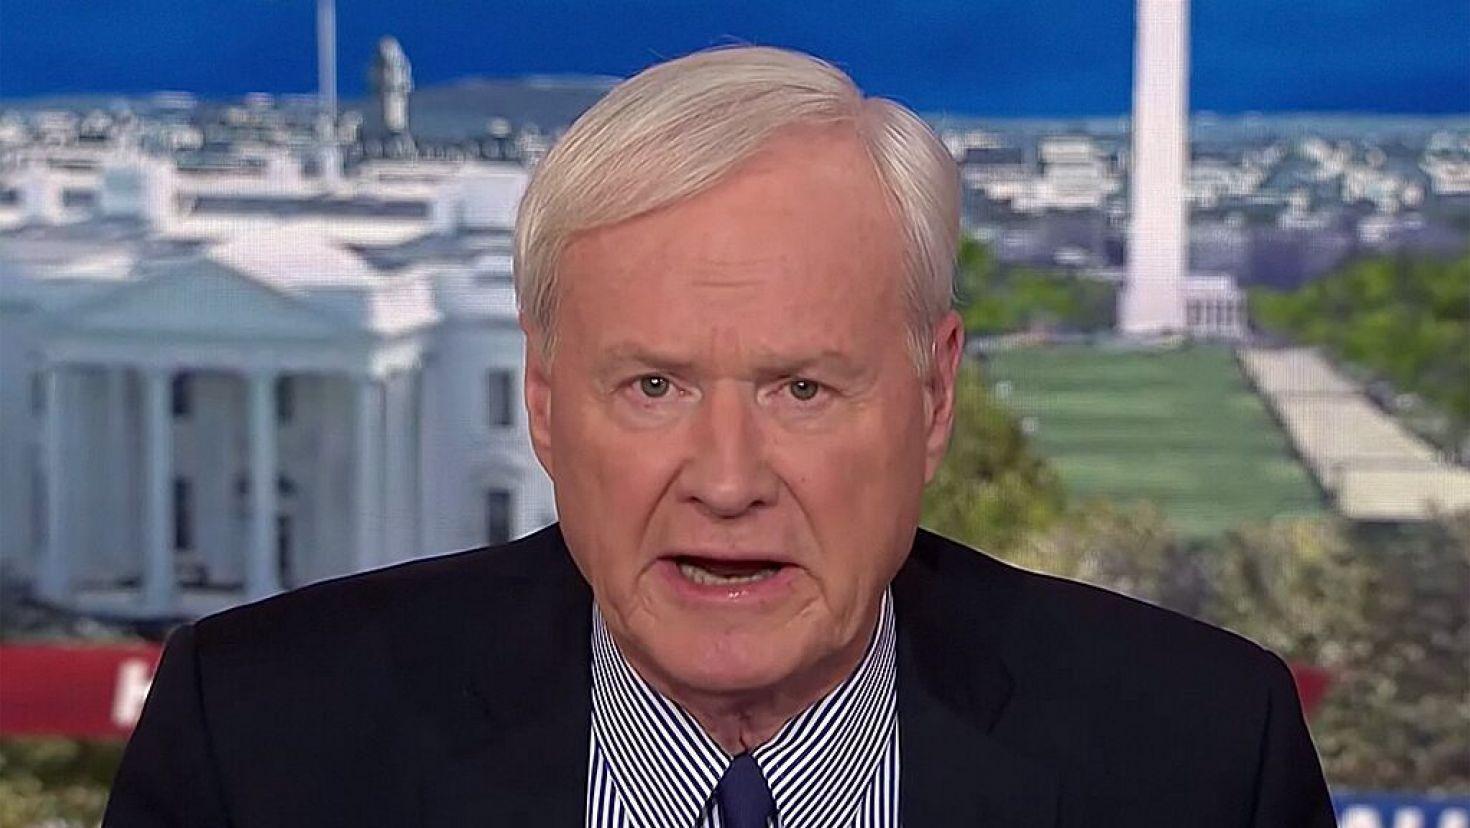 Liberal MSNBC hosts rip Pelosi's call to jail Trump